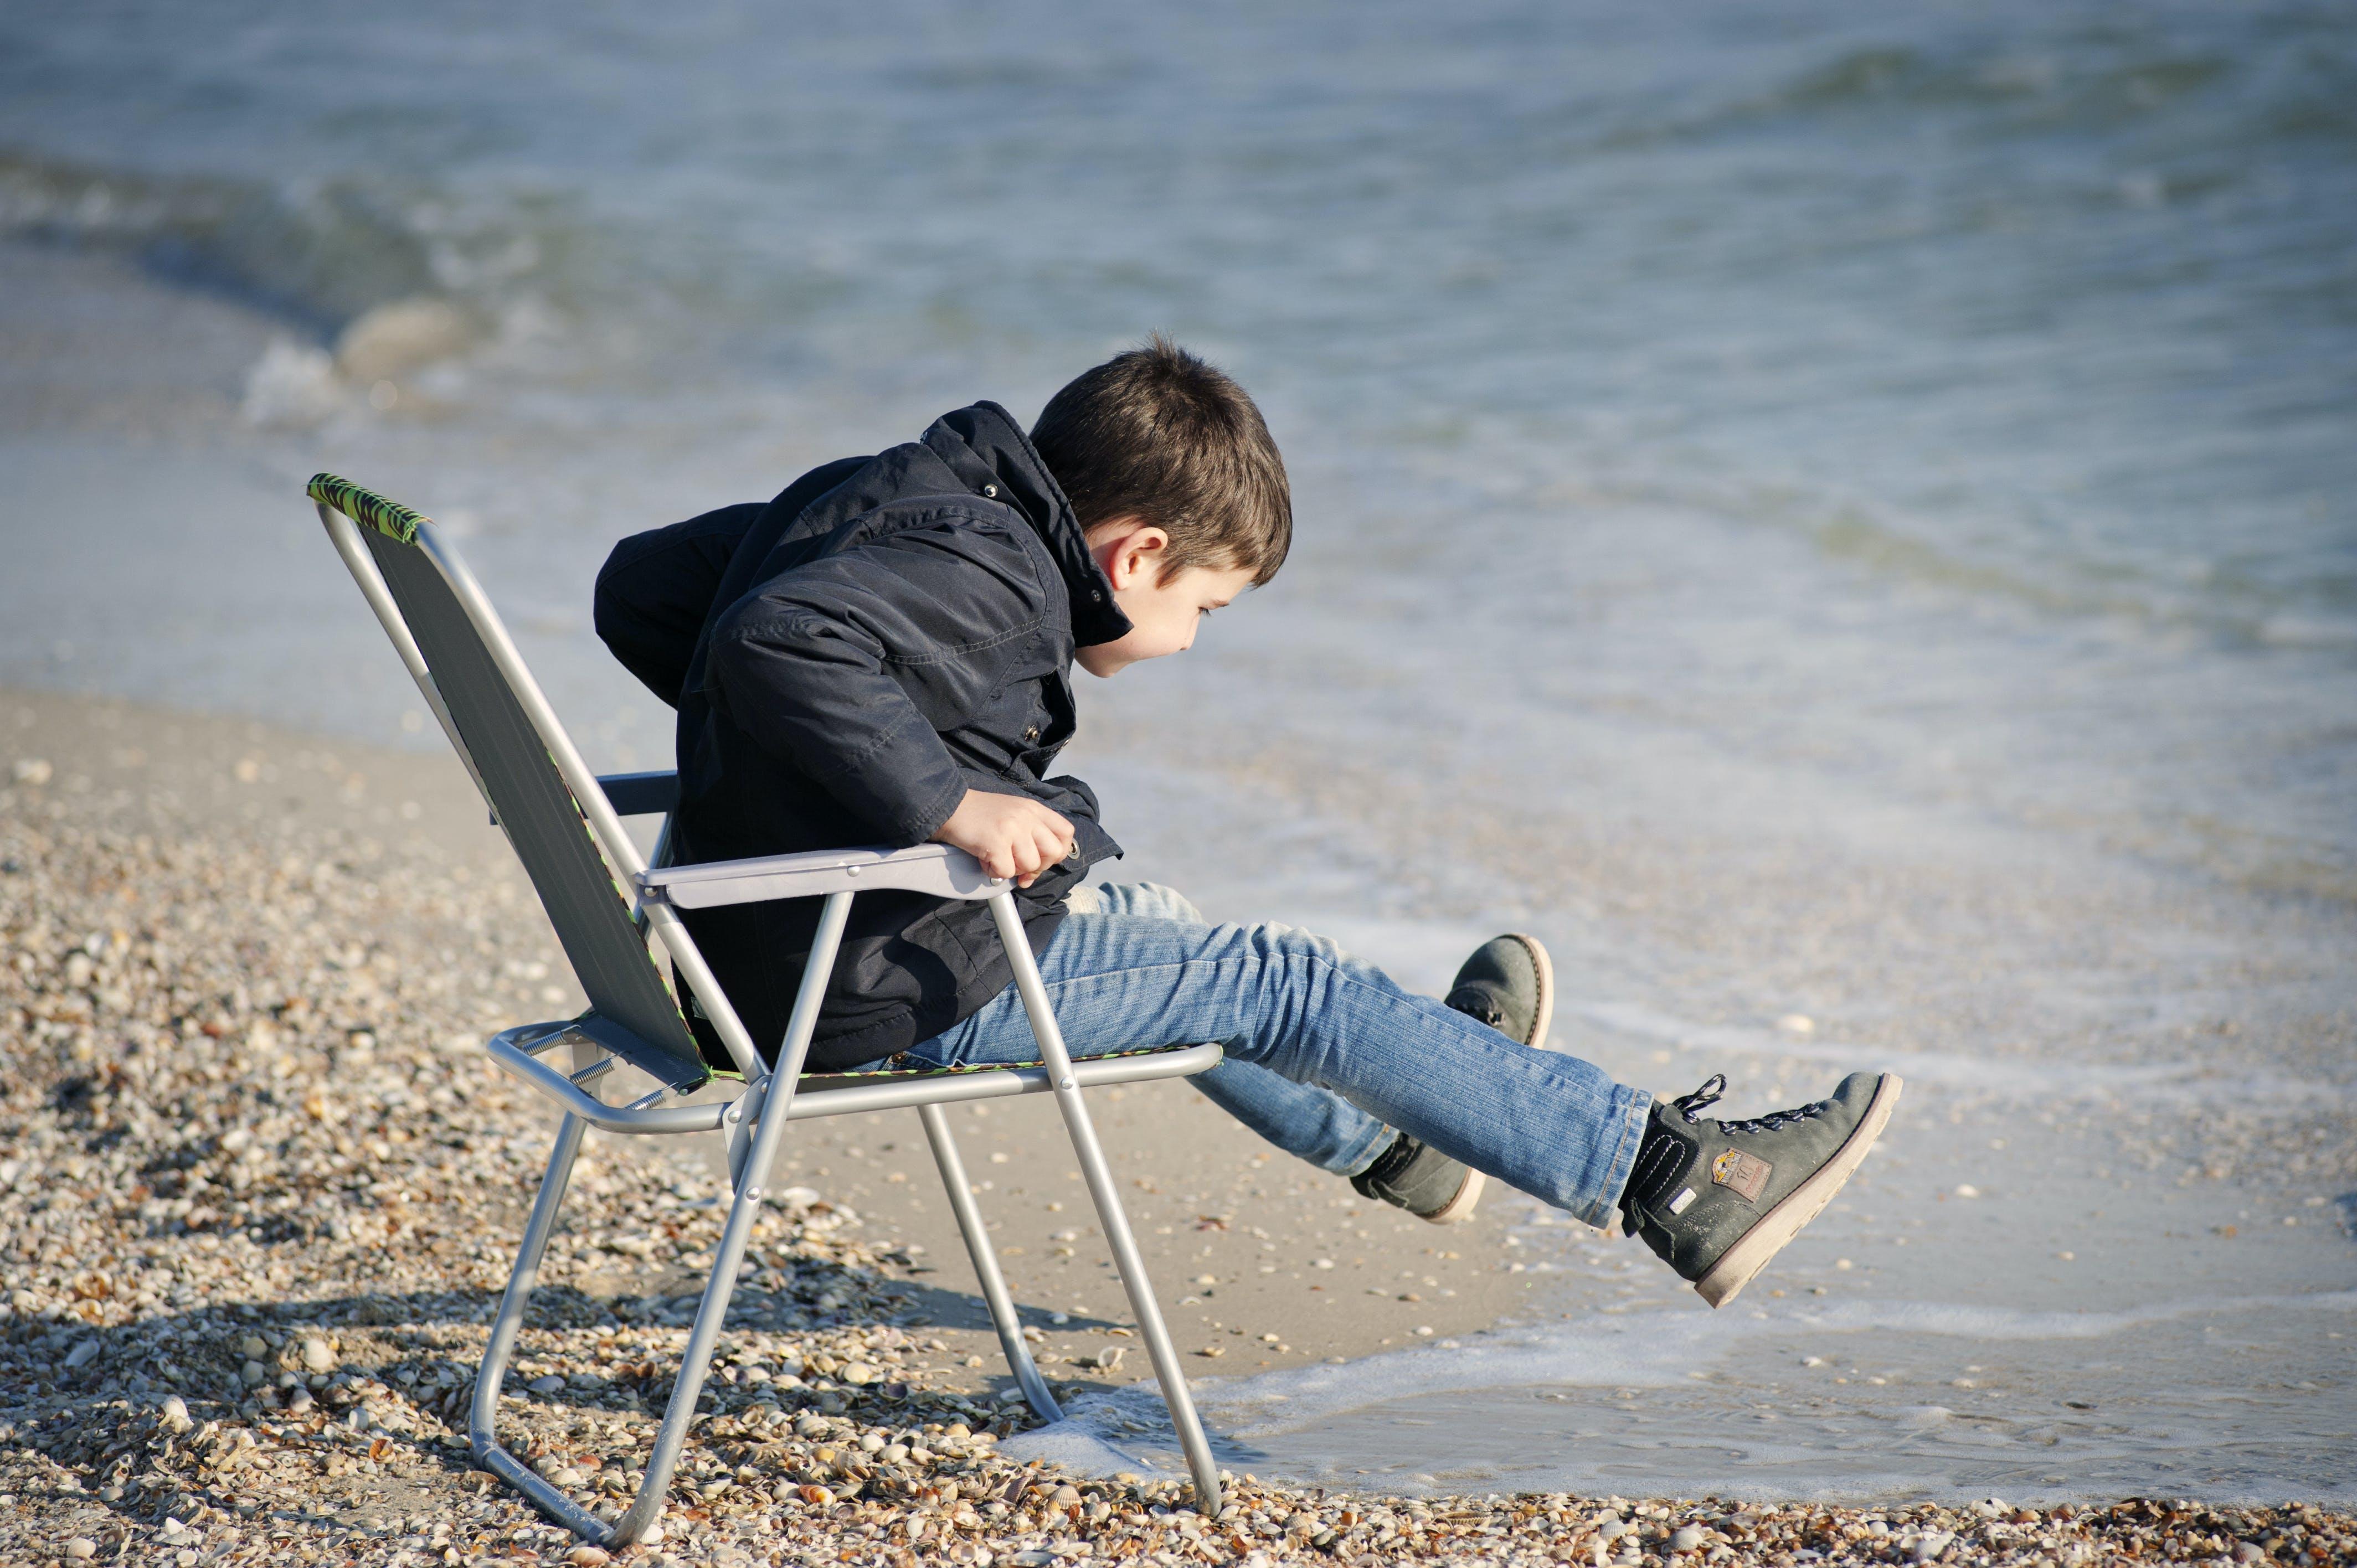 Boy Sitting on Chair Beside Seashore